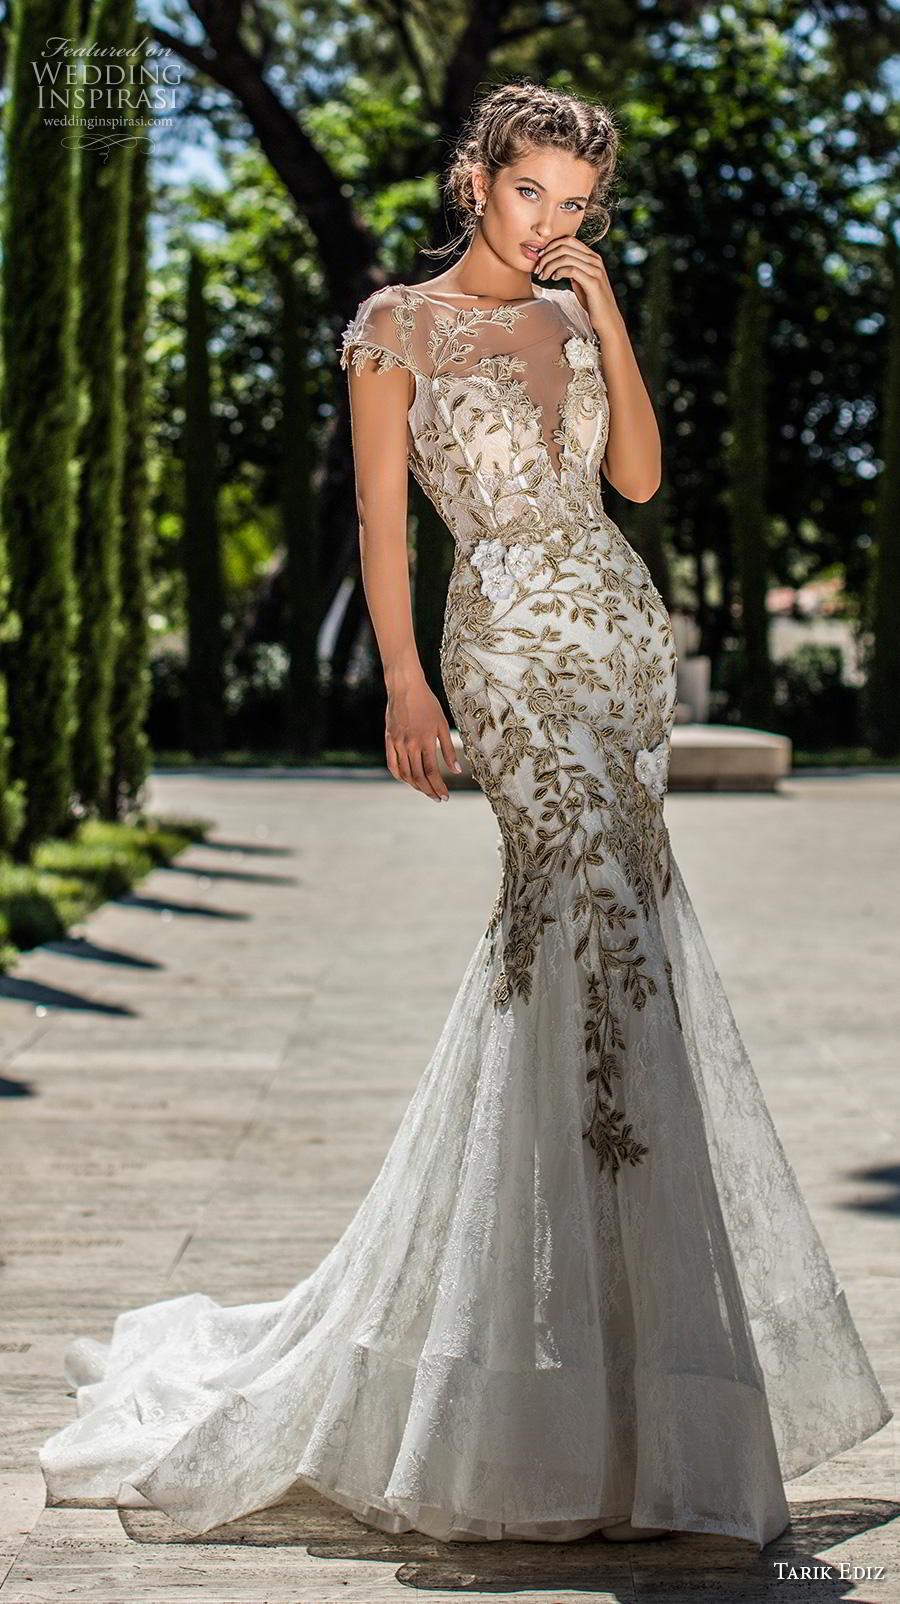 tarik ediz 2019 bridal cap sleeves illusion boat deep plunging sweetheart neckline heavily embellished bodice gold glamorous trumpet wedding dress v back chapel train (10) mv